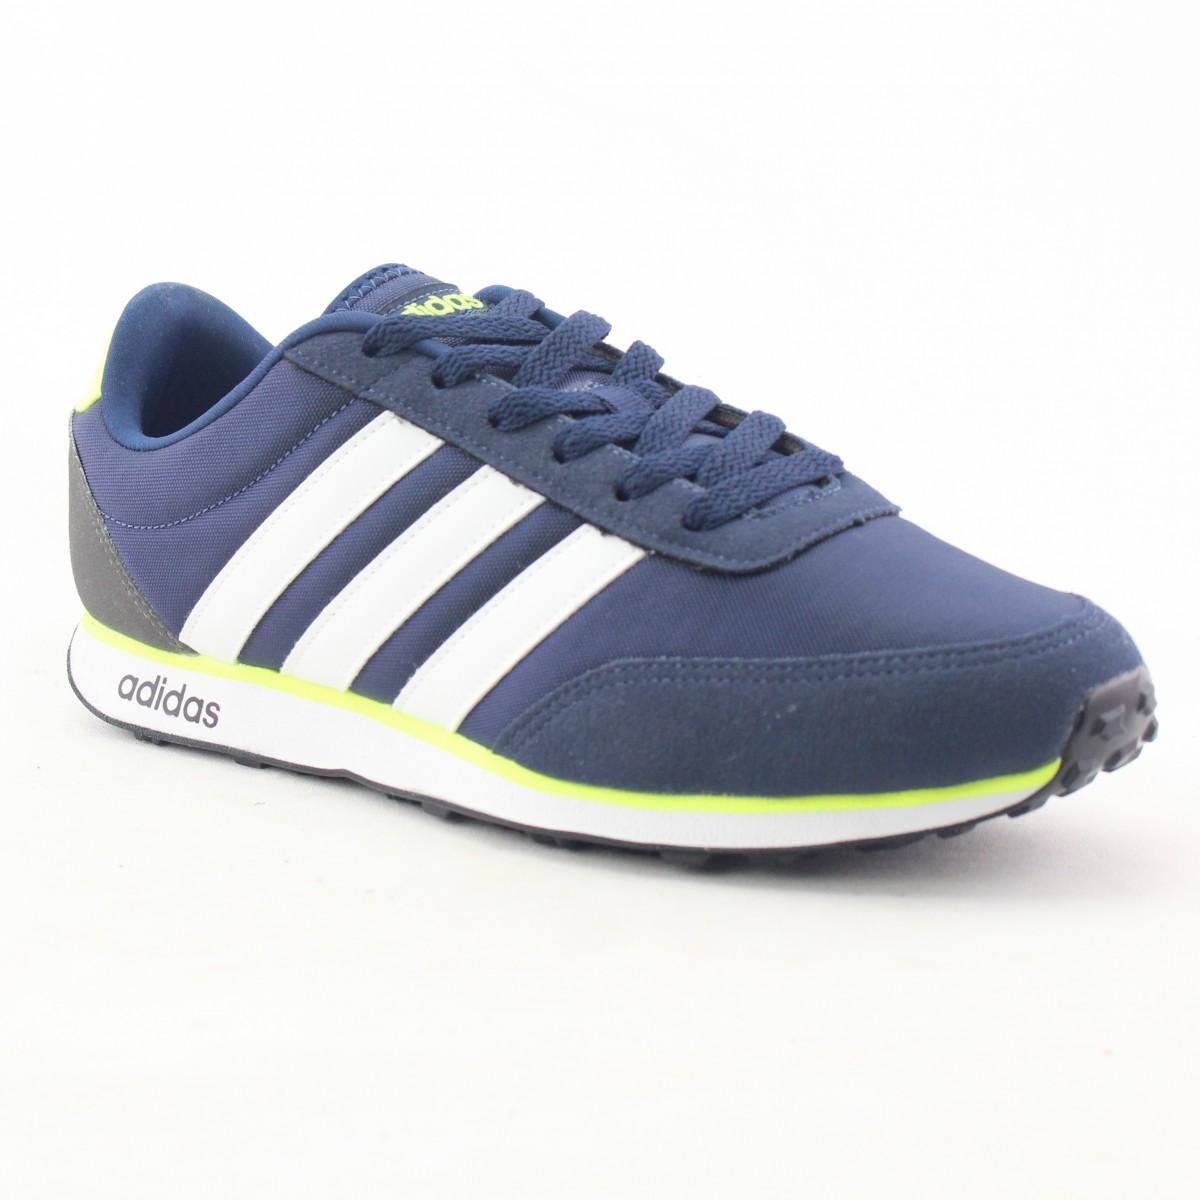 5f61c59d4db Tenis Adidas v Racer